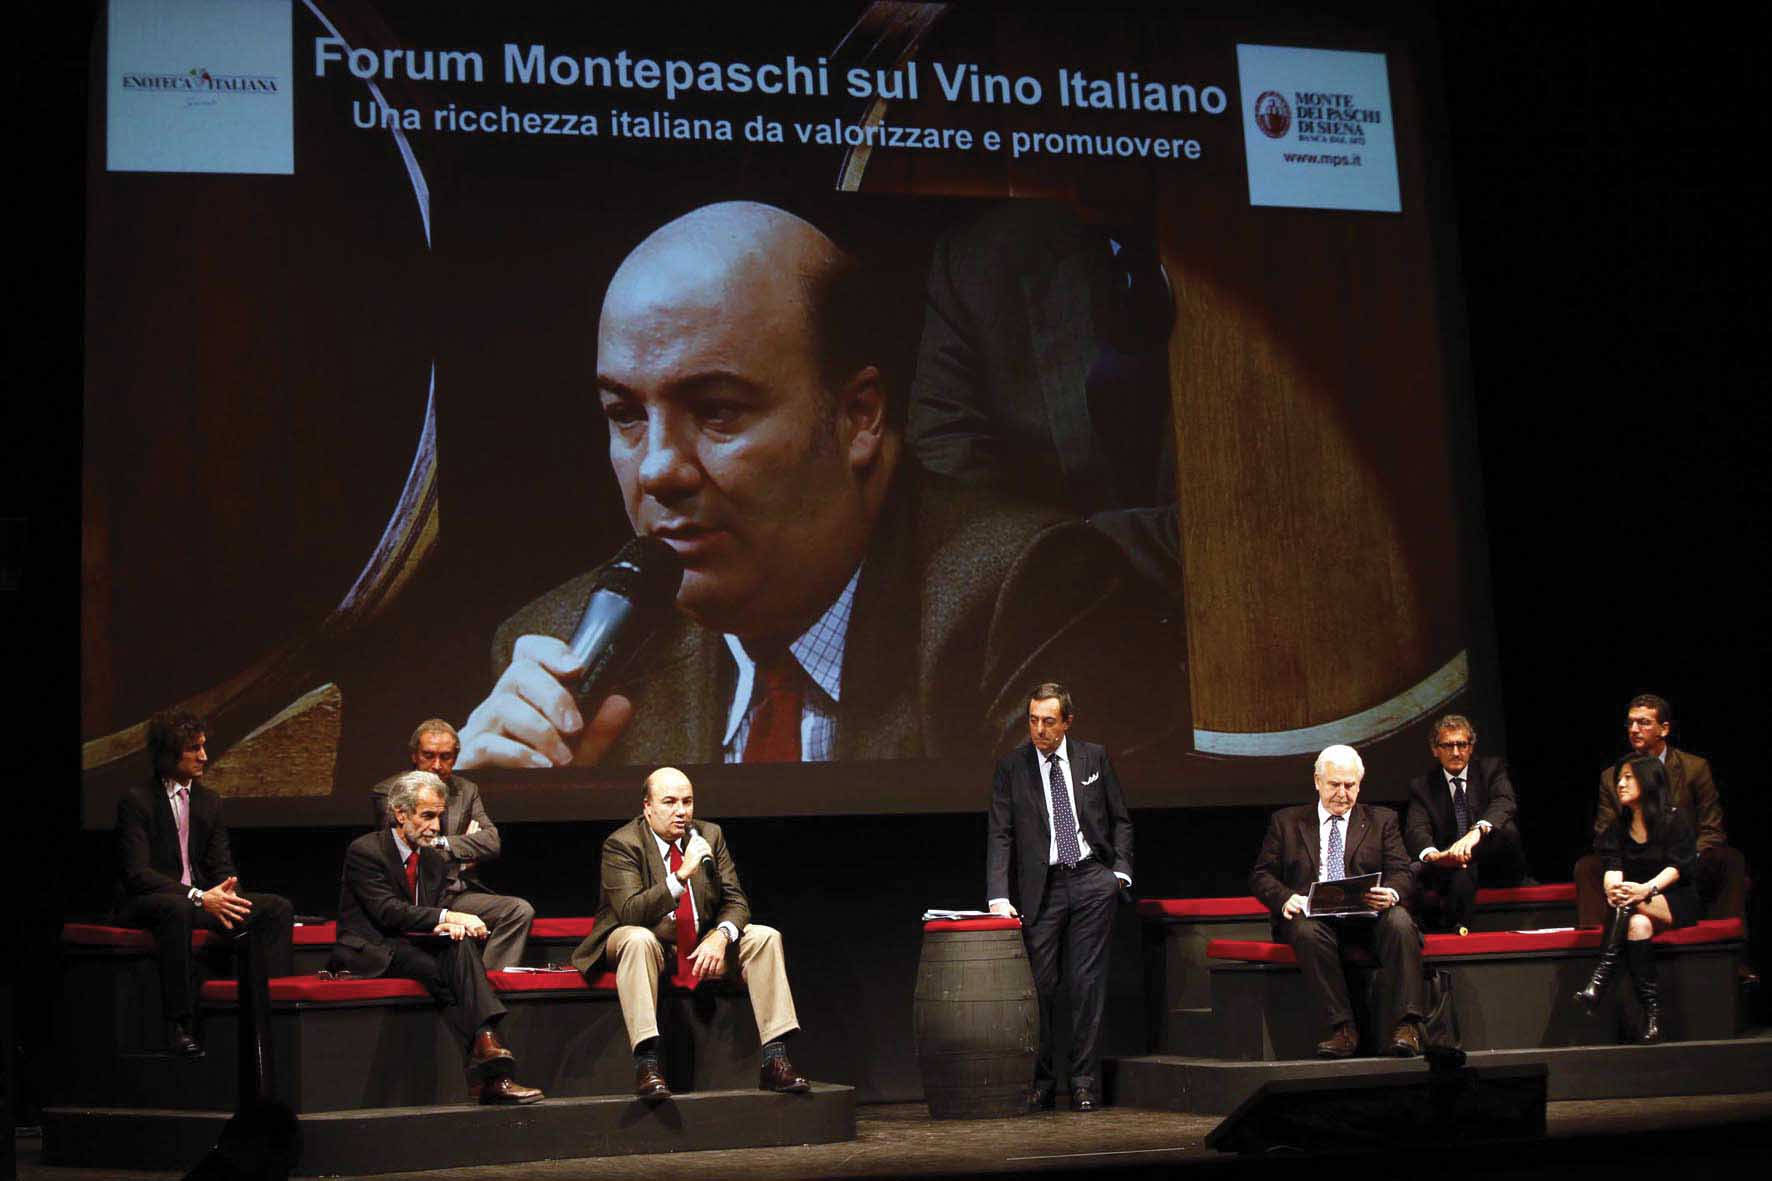 Siena 3 Forum Montepaschi sul vino italiano 1